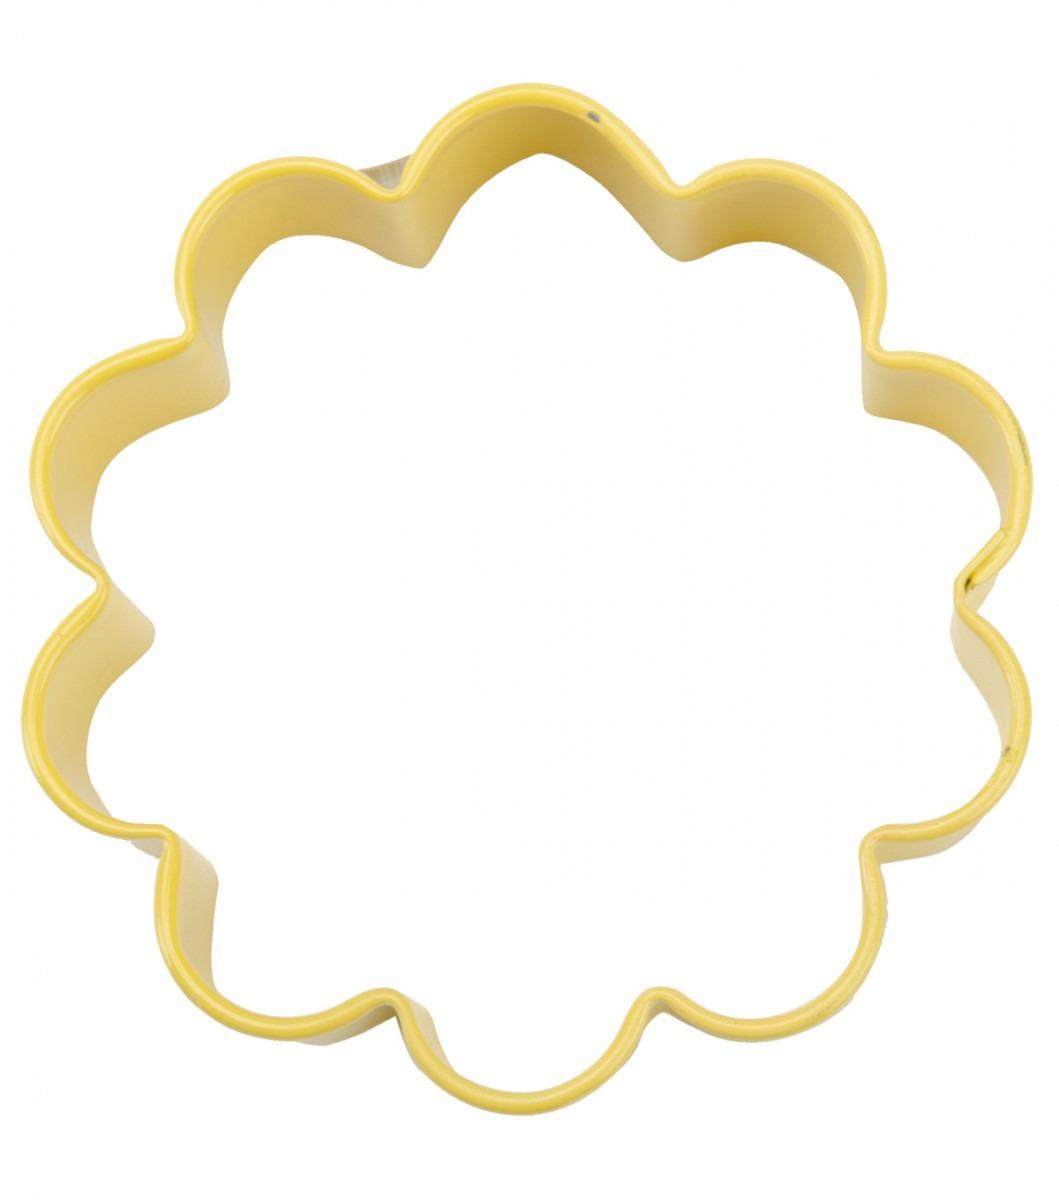 Wilton Metal Cookie Cutter 3